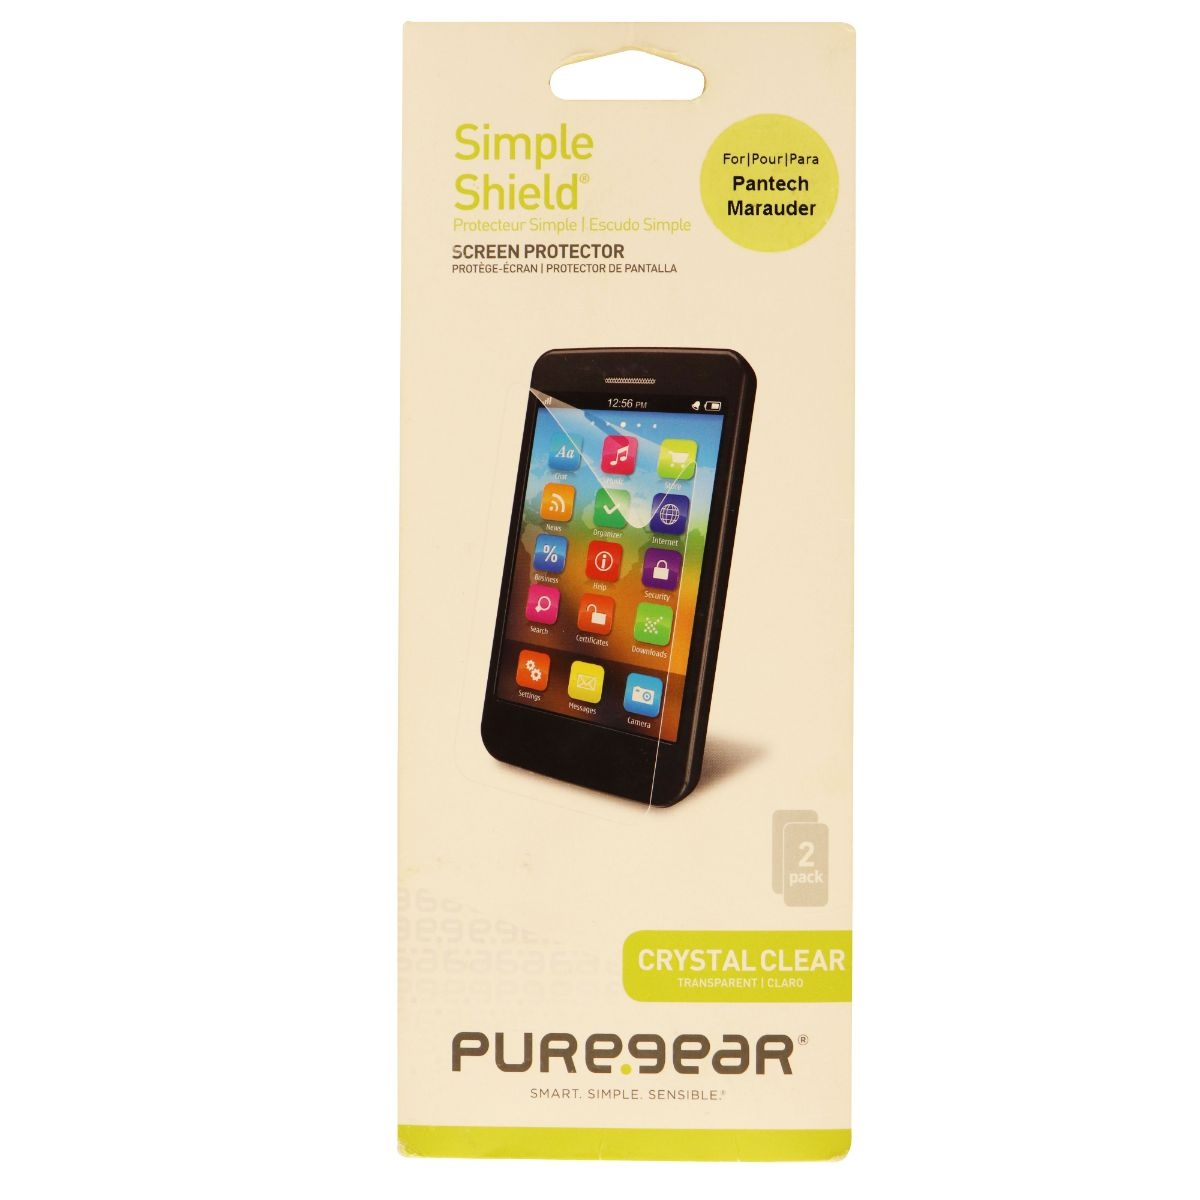 PureGear Simple Shield Crystal Screen Protector for Pantech Marauder 2 Pack